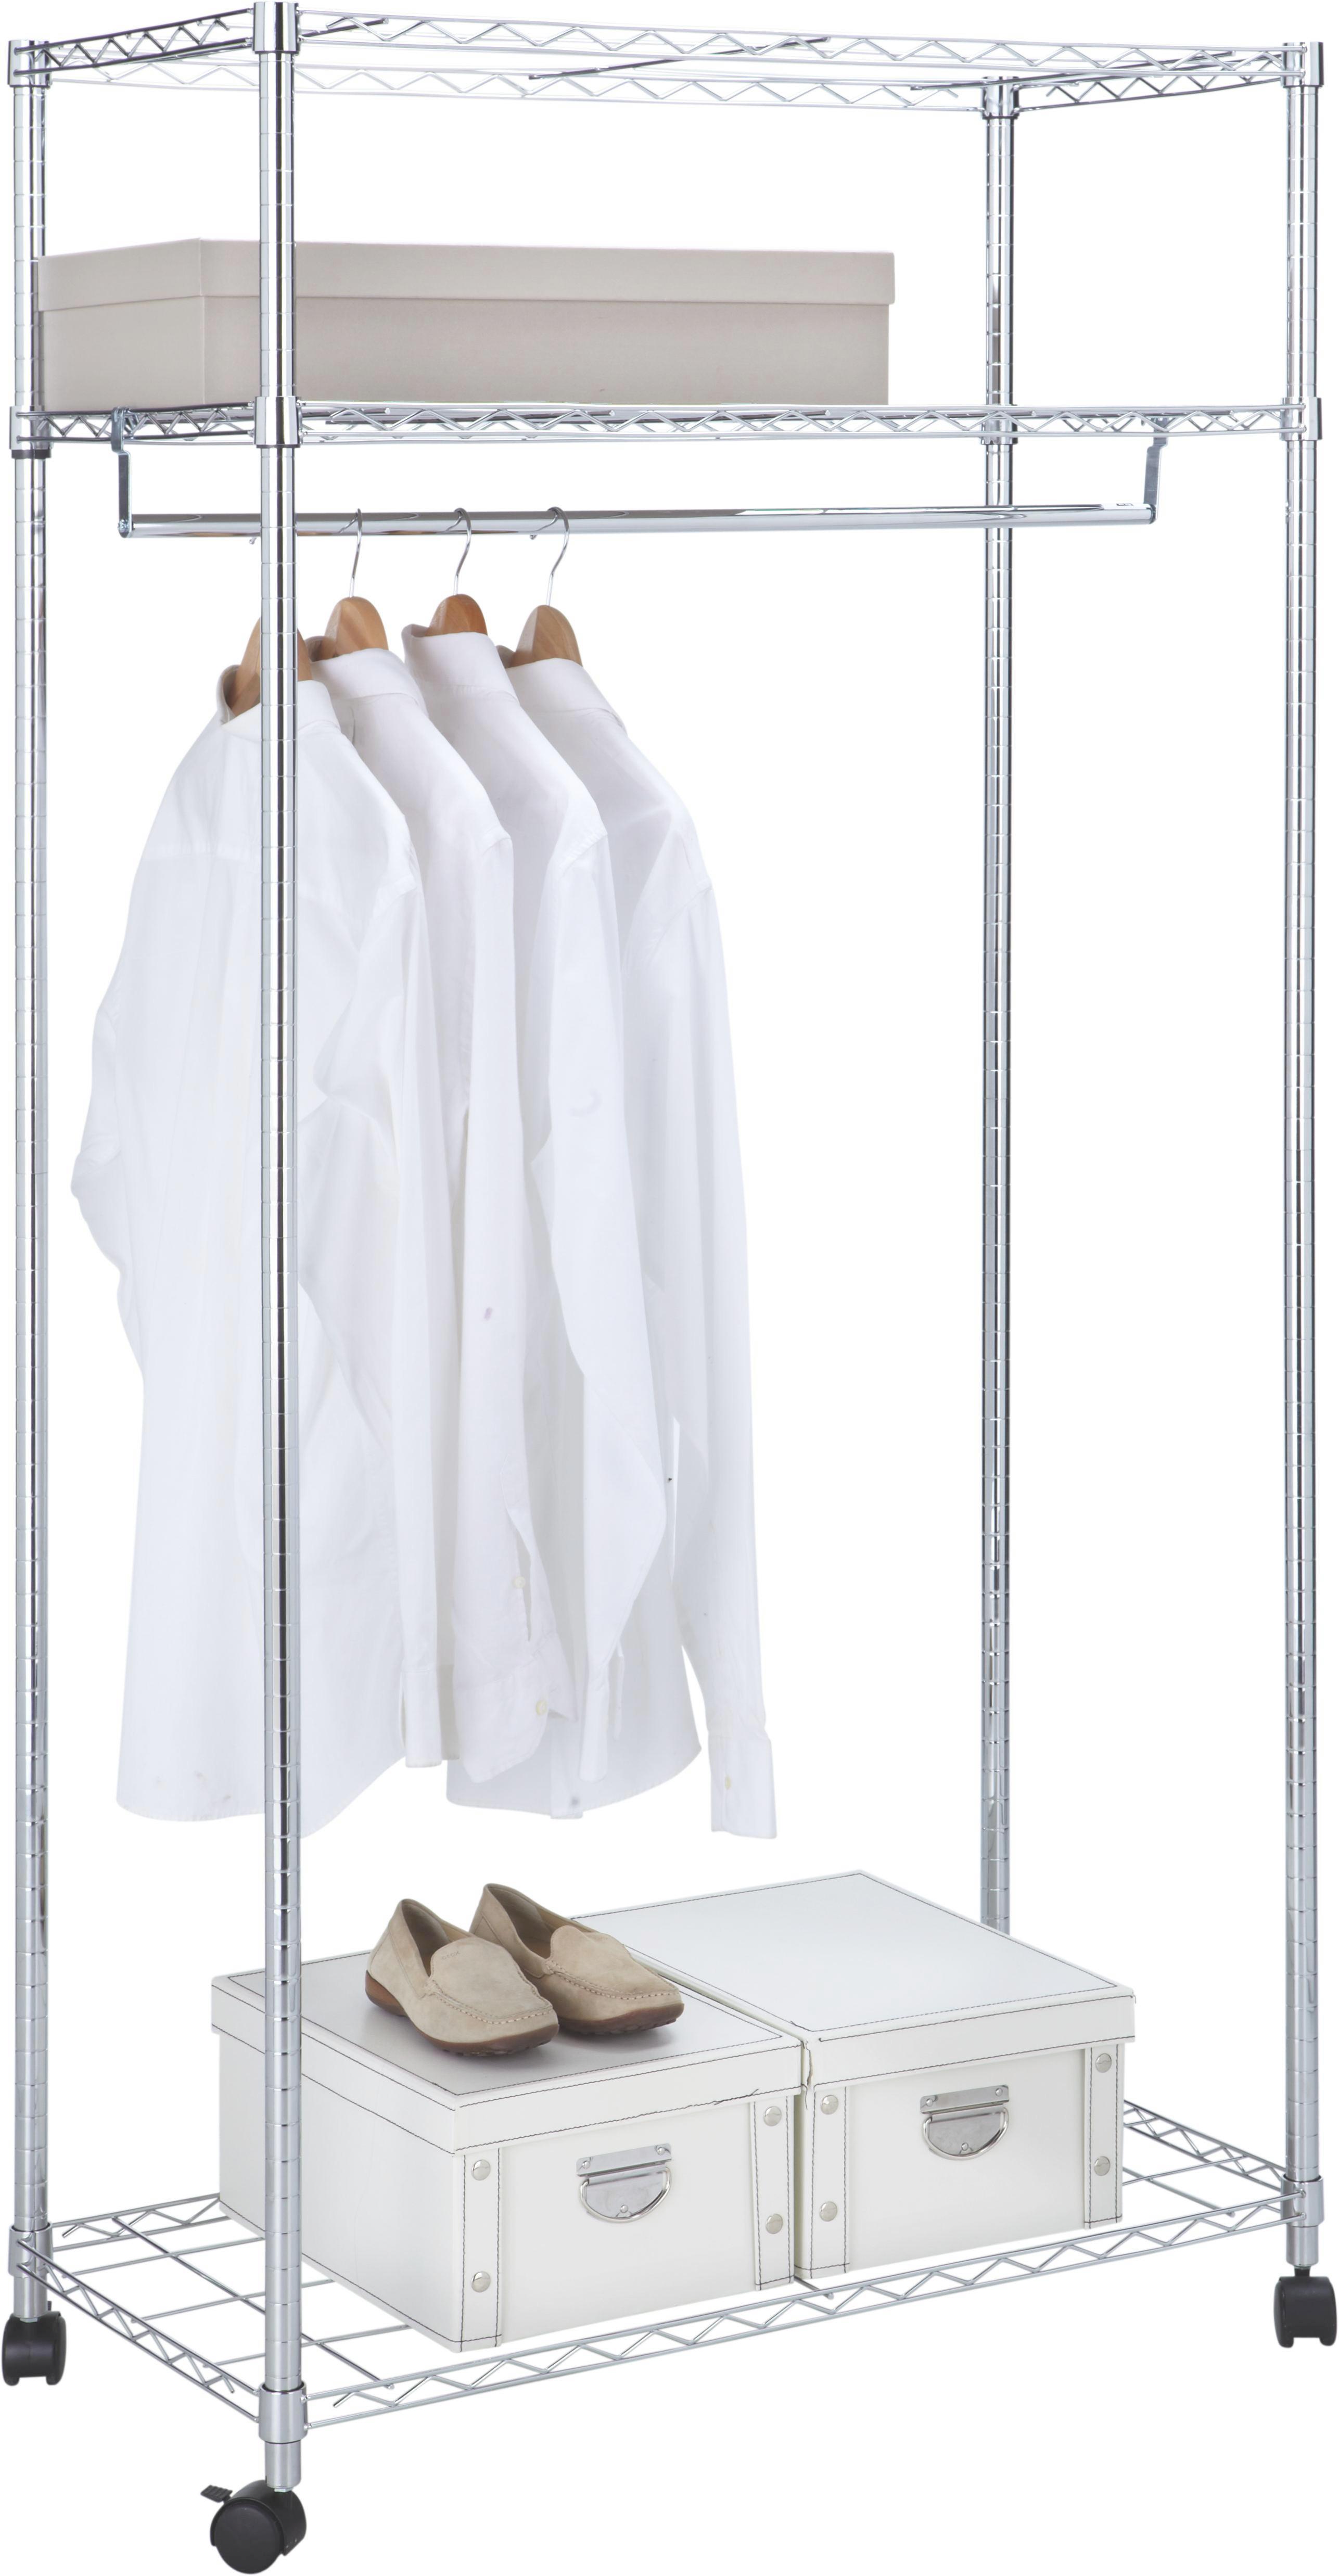 Mobilno Stojalo Za Obleke Saturn - barve kroma, kovina/umetna masa (91/182,5/46cm) - MÖMAX modern living